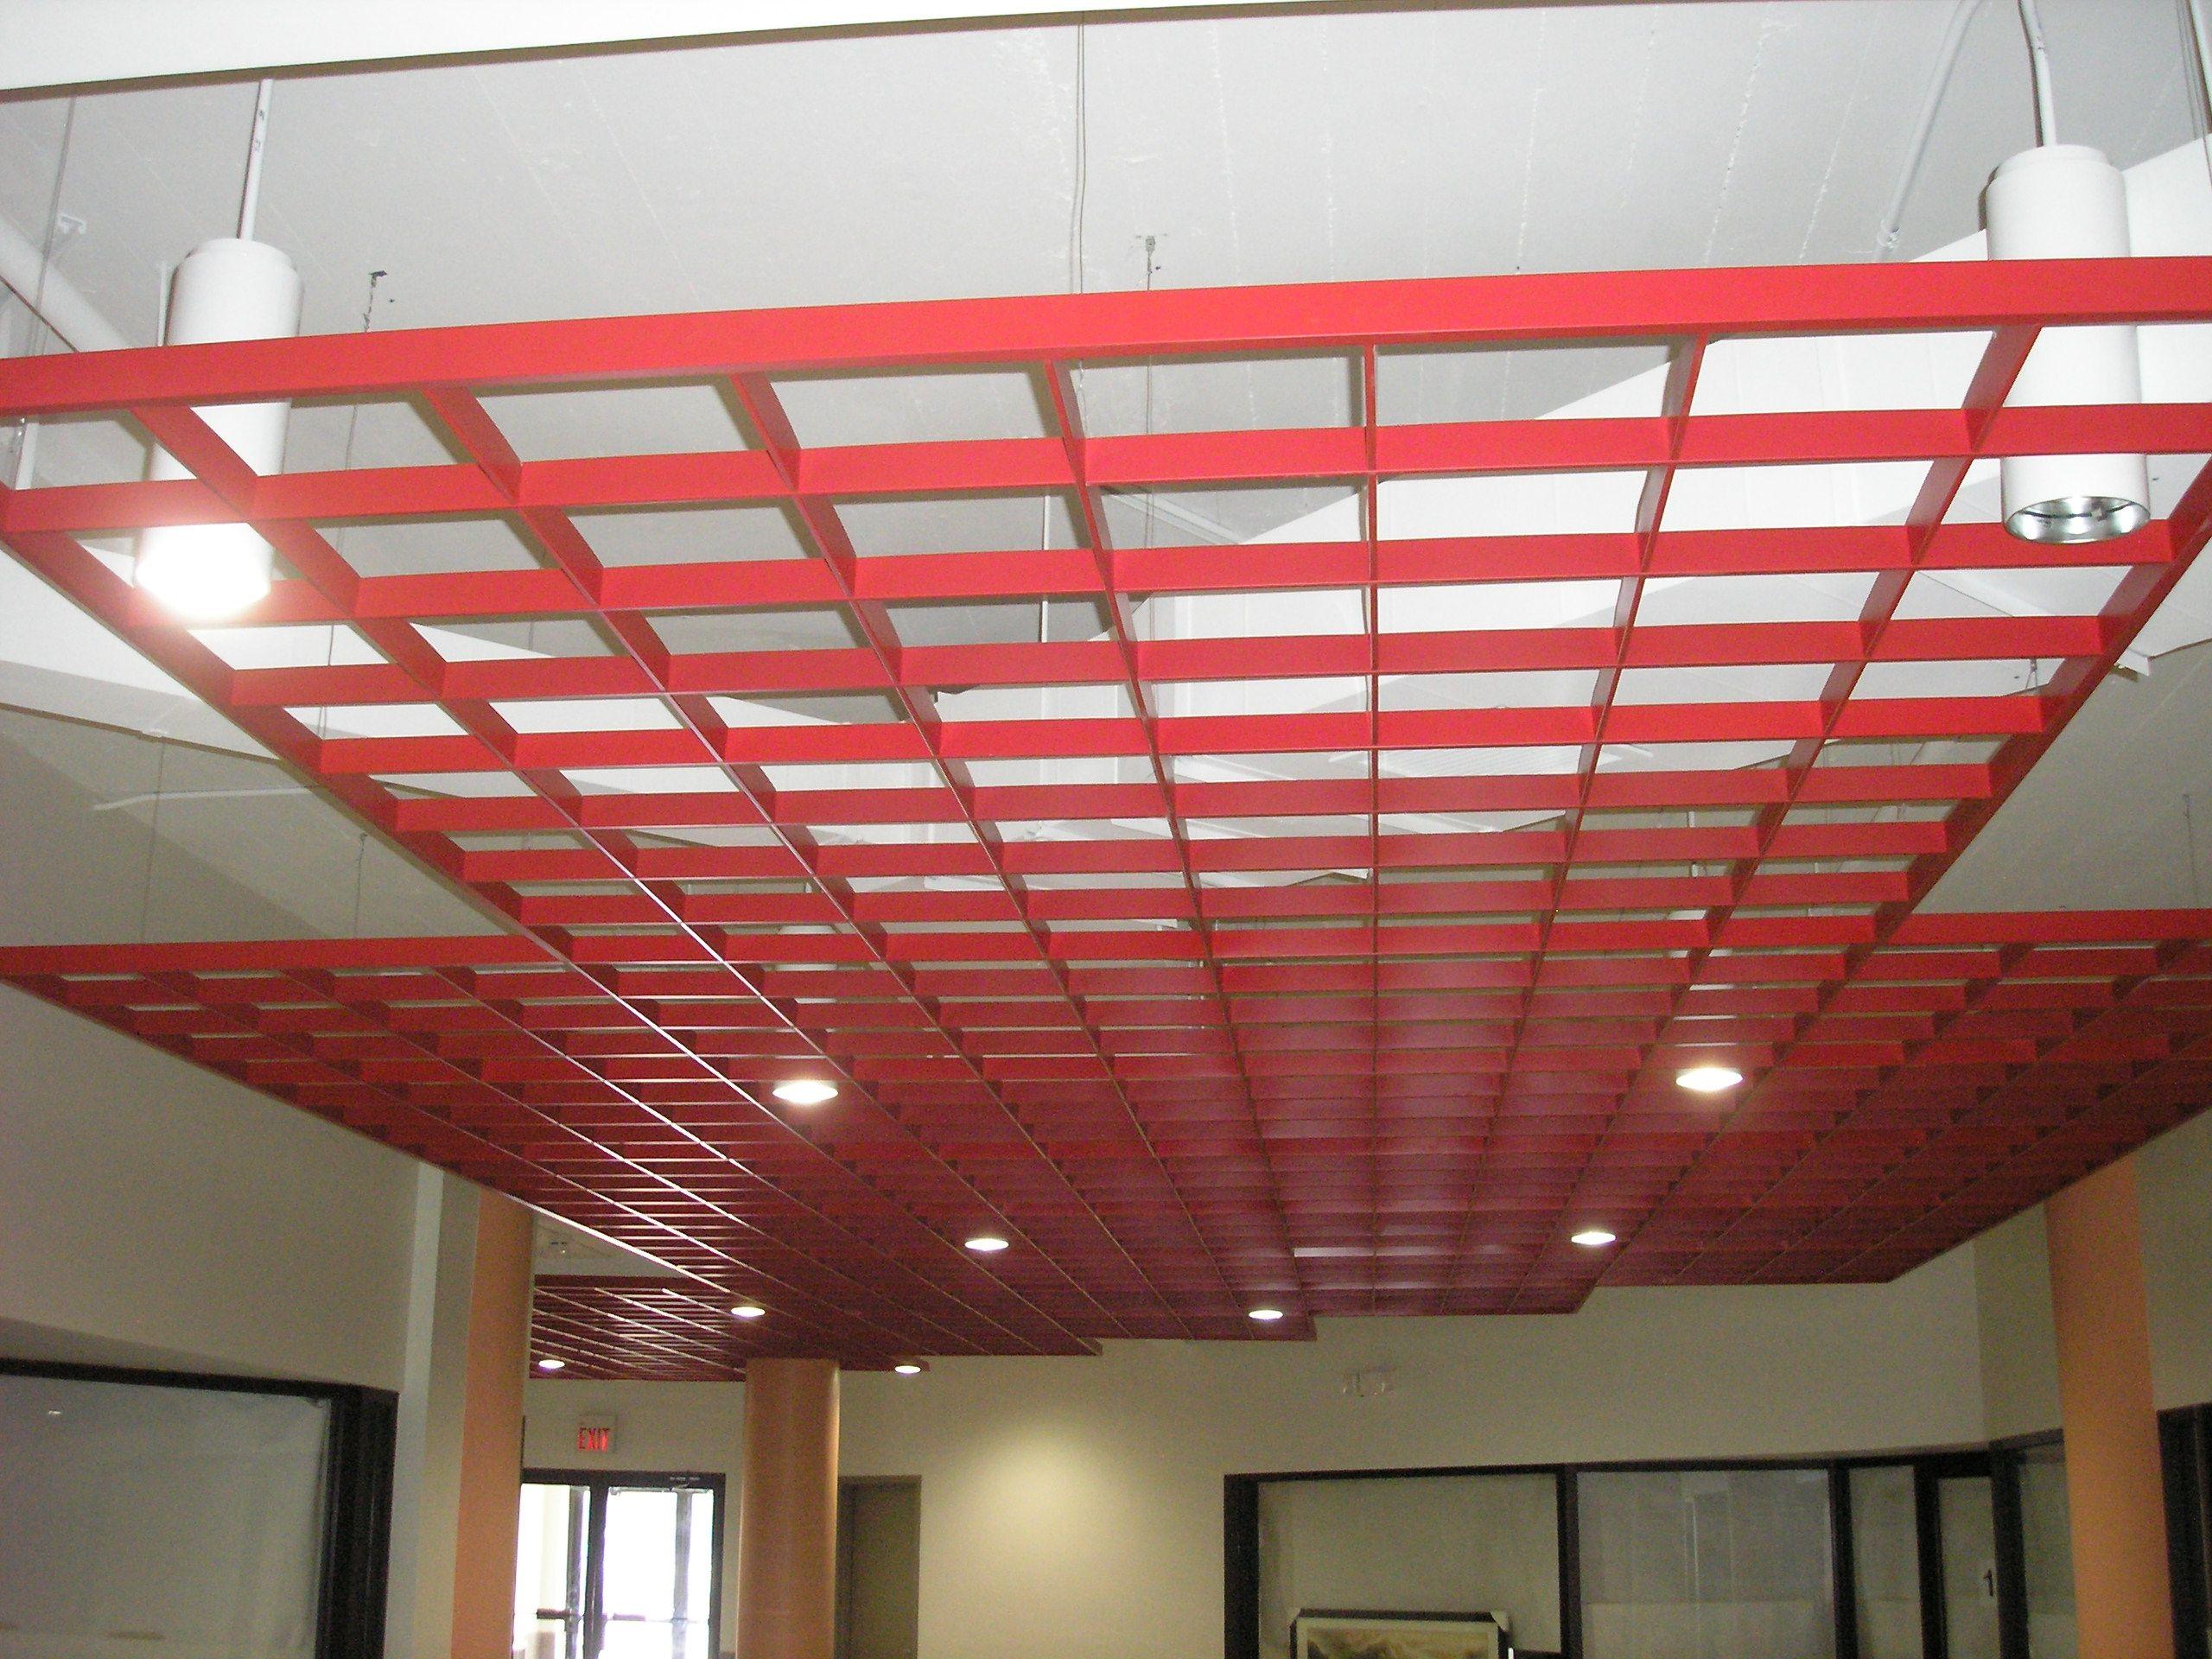 Contemporary Drop Ceiling Grid | Velocity | Pinterest ...